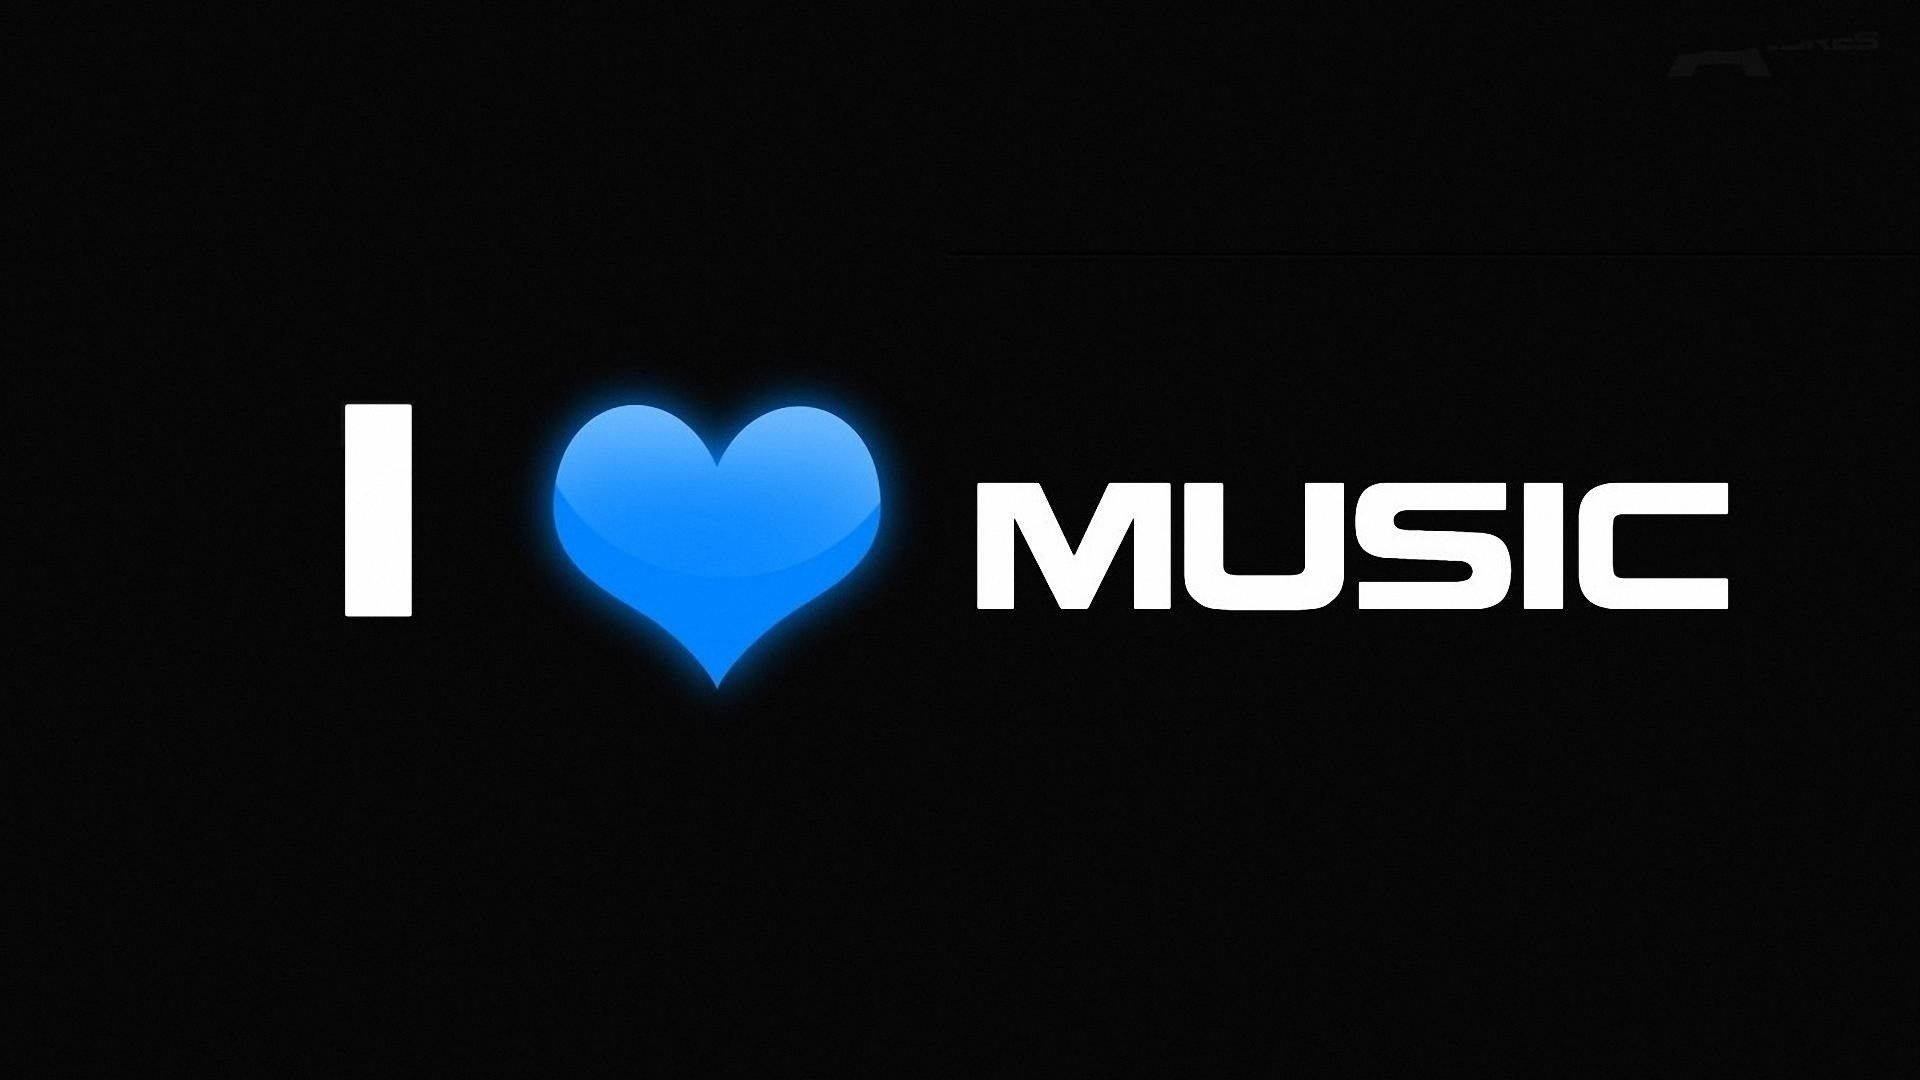 I Love Music Widescreen